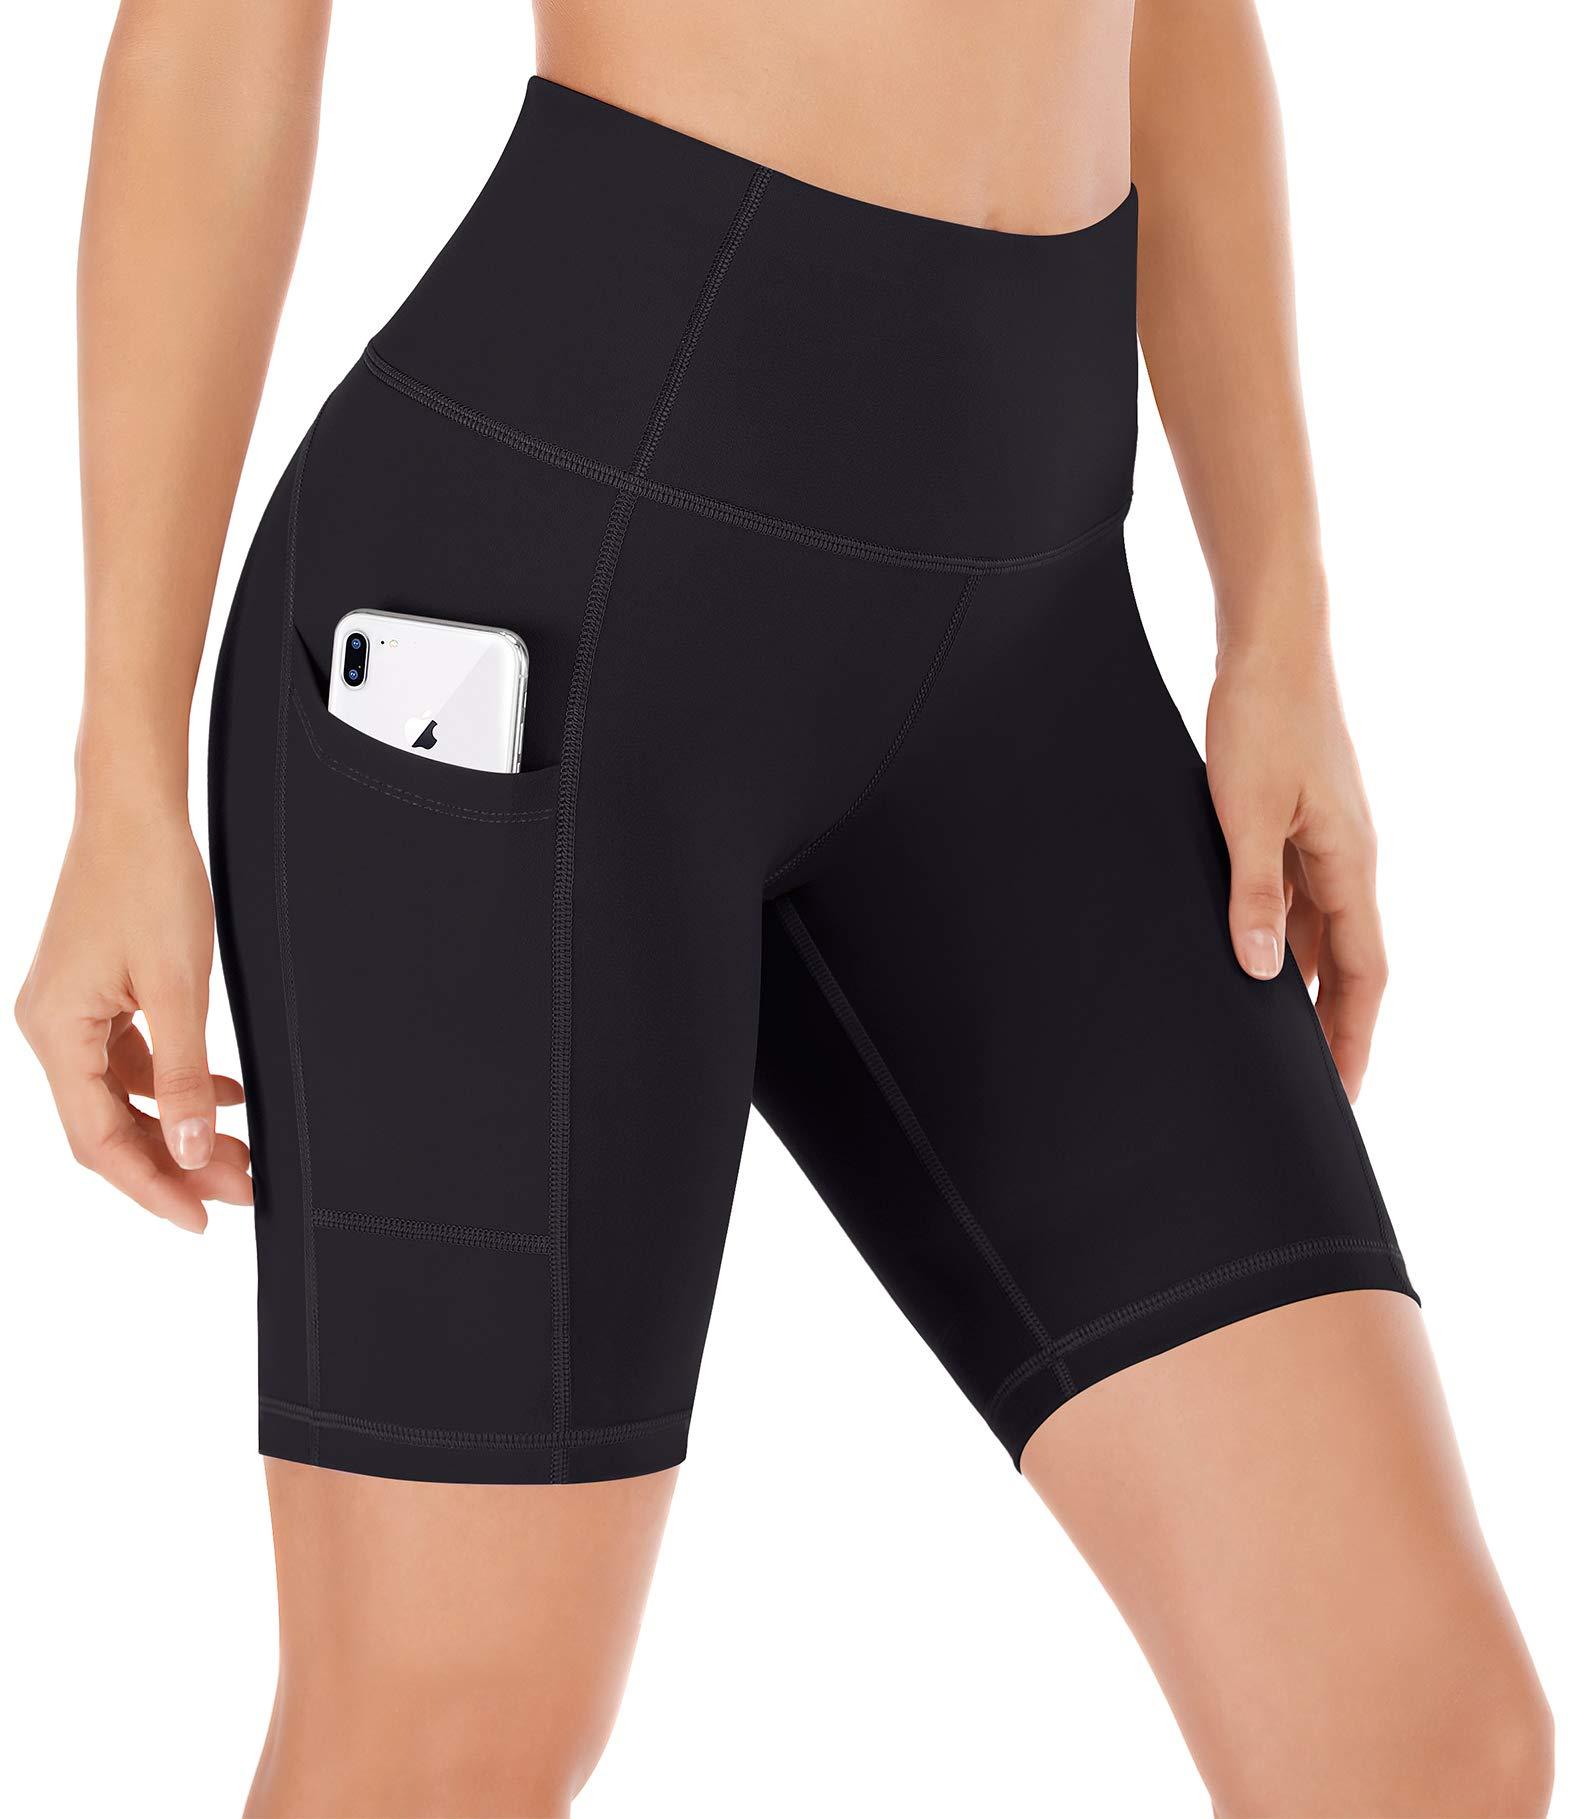 Ewedoos Women Shorts with Pockets - High Waist Running Shorts Women Workout Non See-Through Yoga Shorts (EW321 Black, X-Small) by Ewedoos